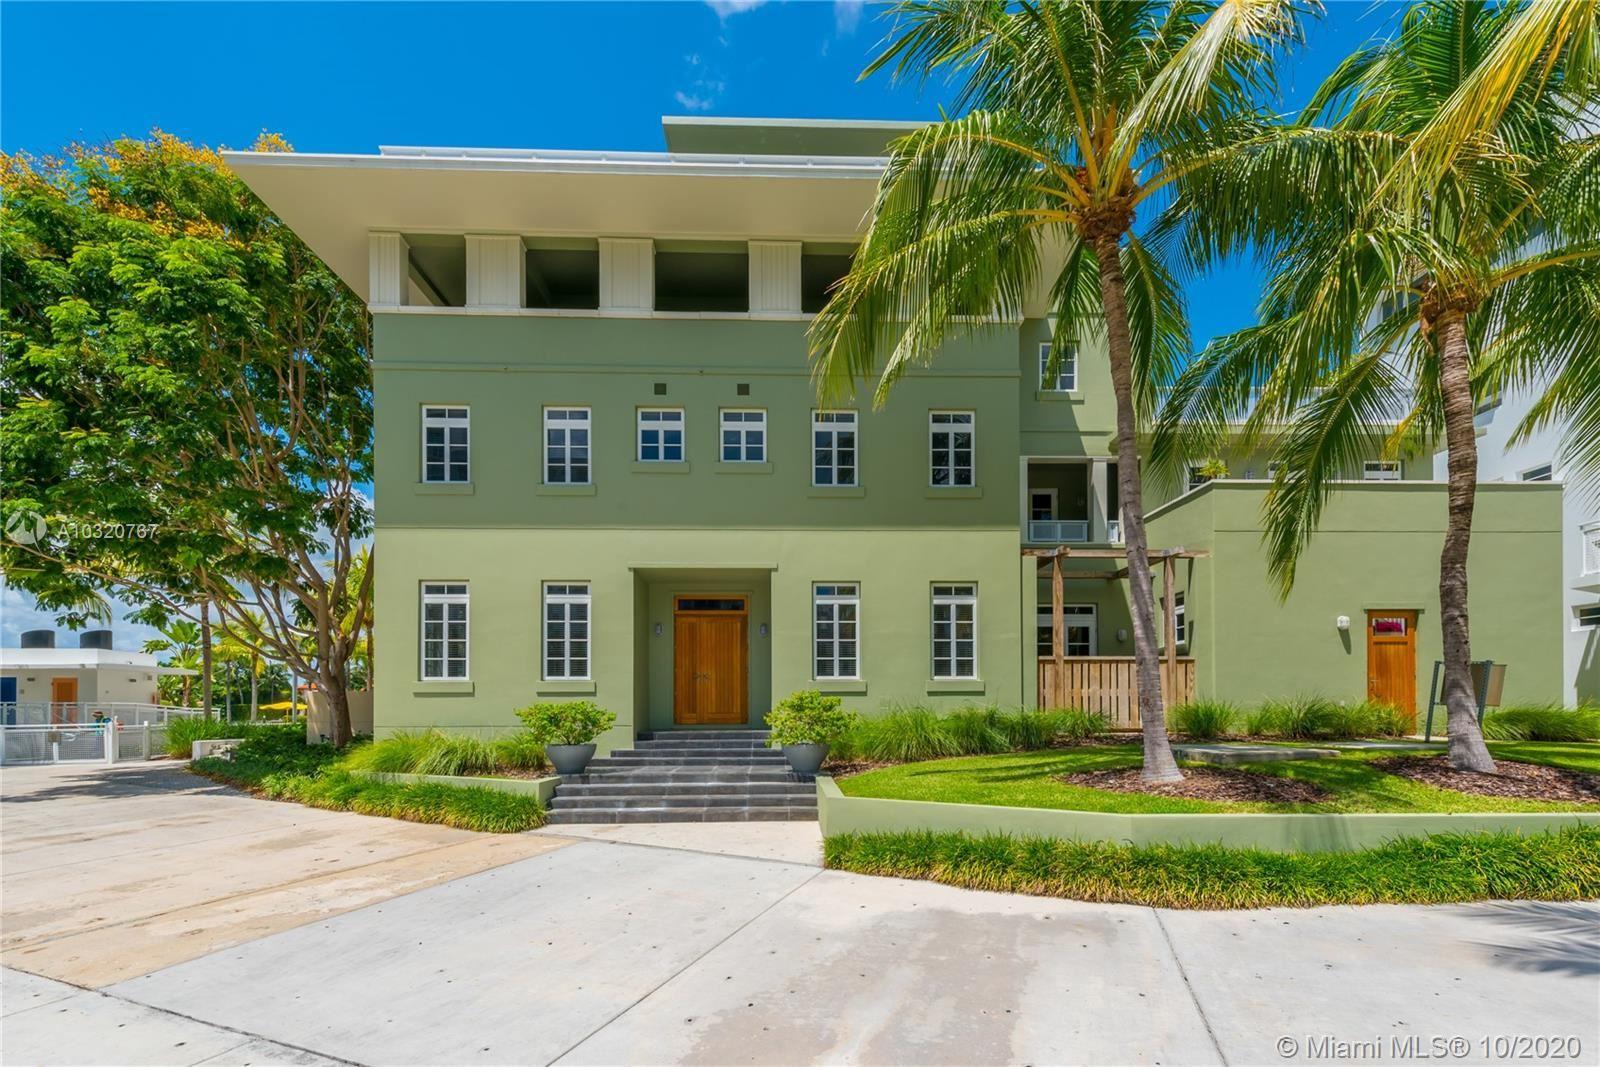 6000 Aqua Path #BLK 10, Miami Beach, FL 33141 - #: A10320767